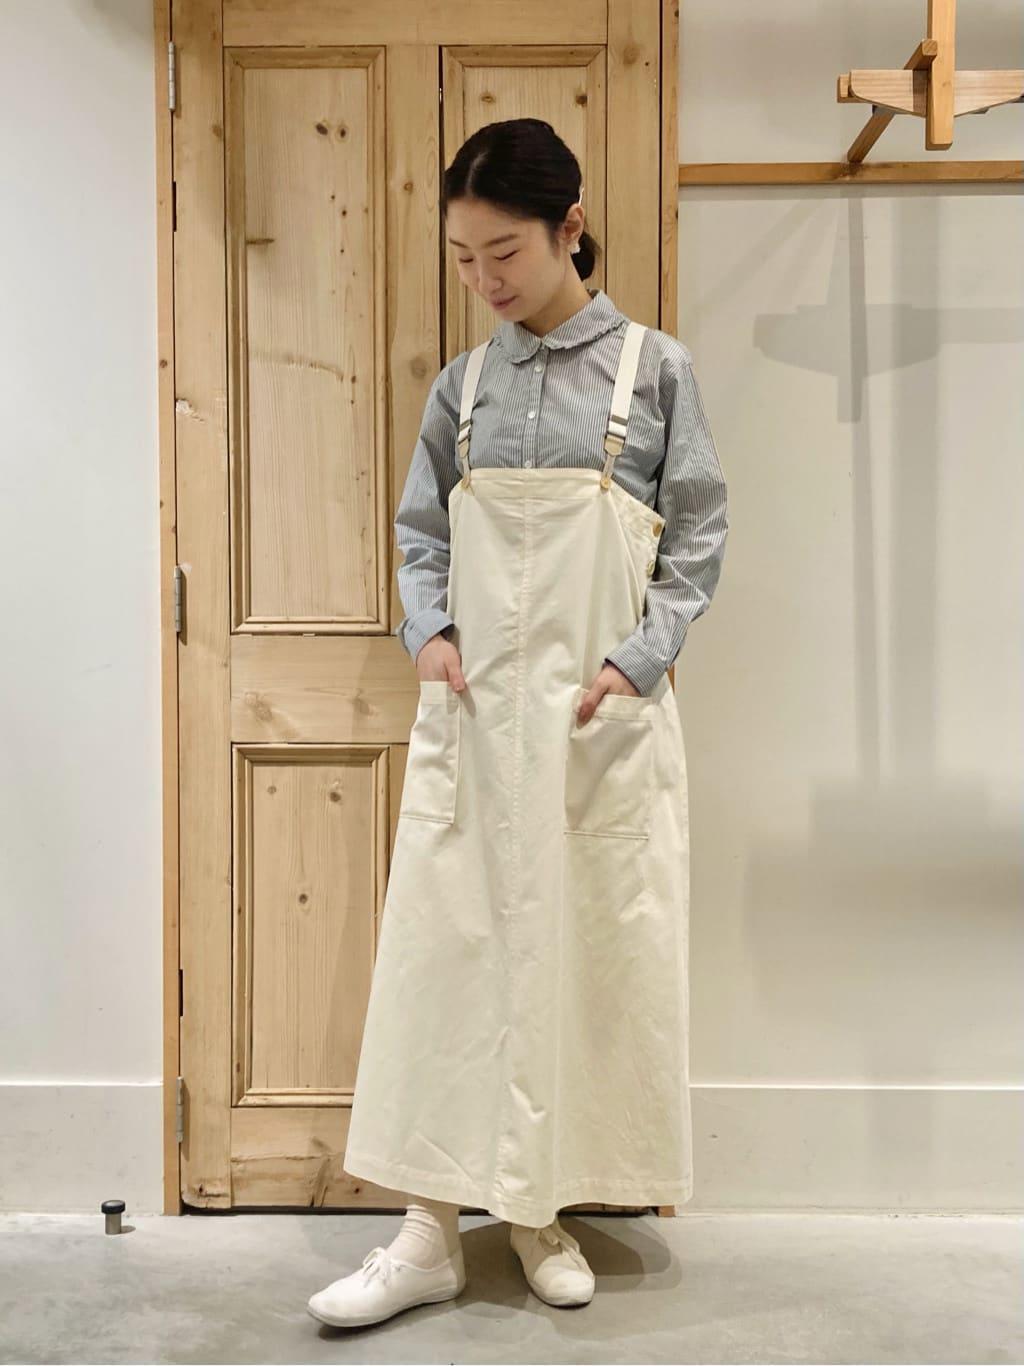 Malle chambre de charme 調布パルコ 身長:162cm 2021.08.22